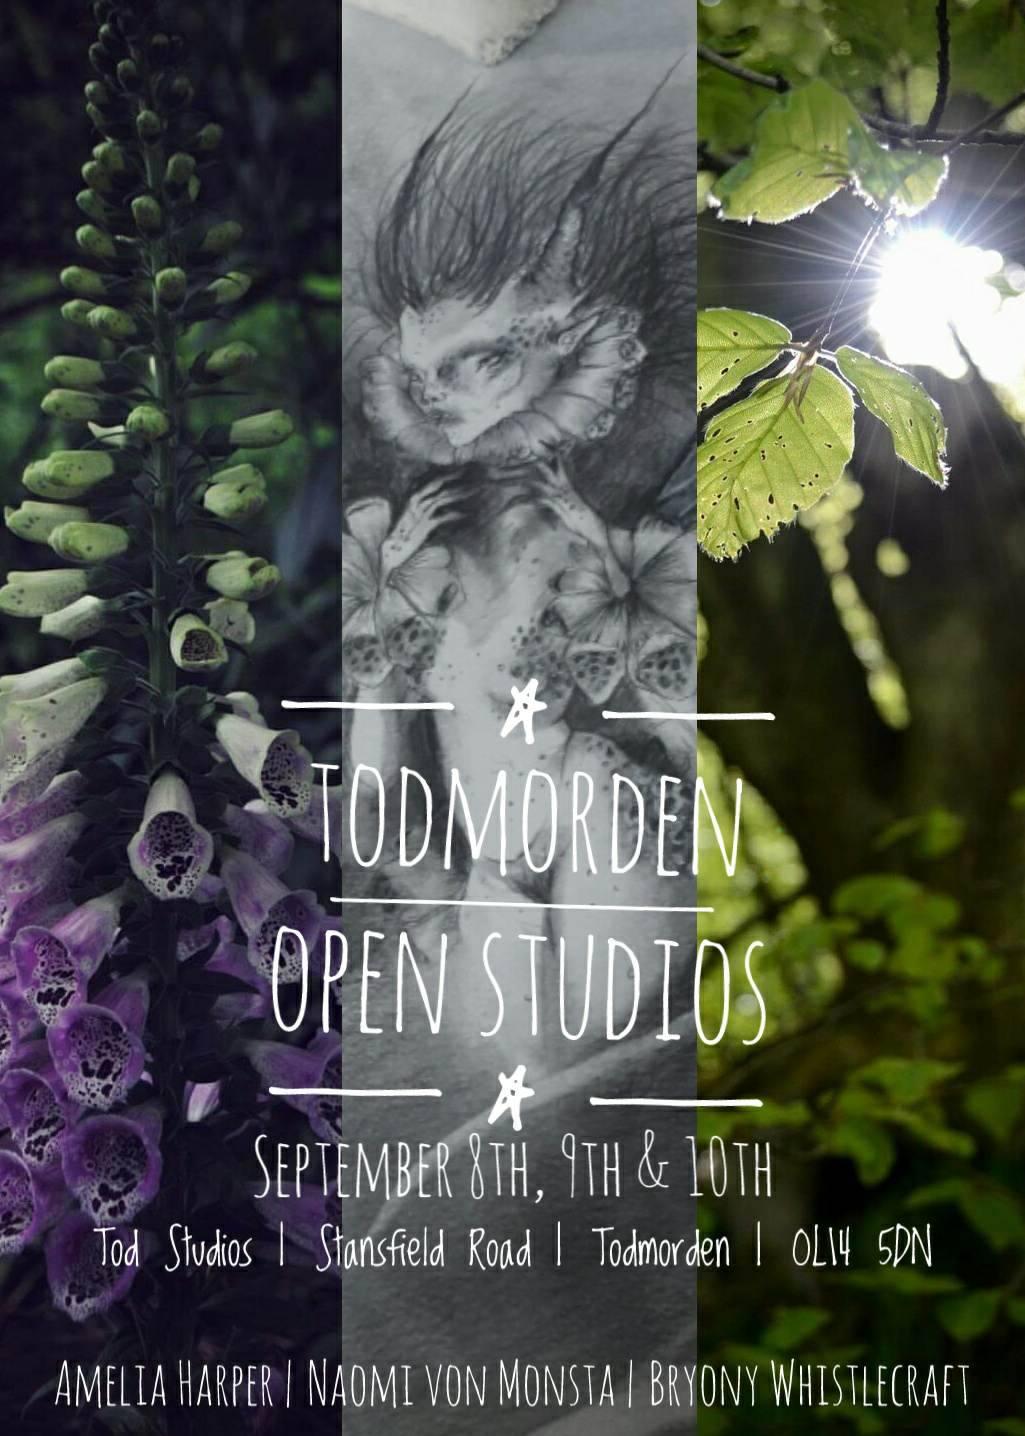 People of the Hills at Todmorden Open Studios 2017 | Amelia Harper - Naomi von Monsta - Bryony Whistlecraft